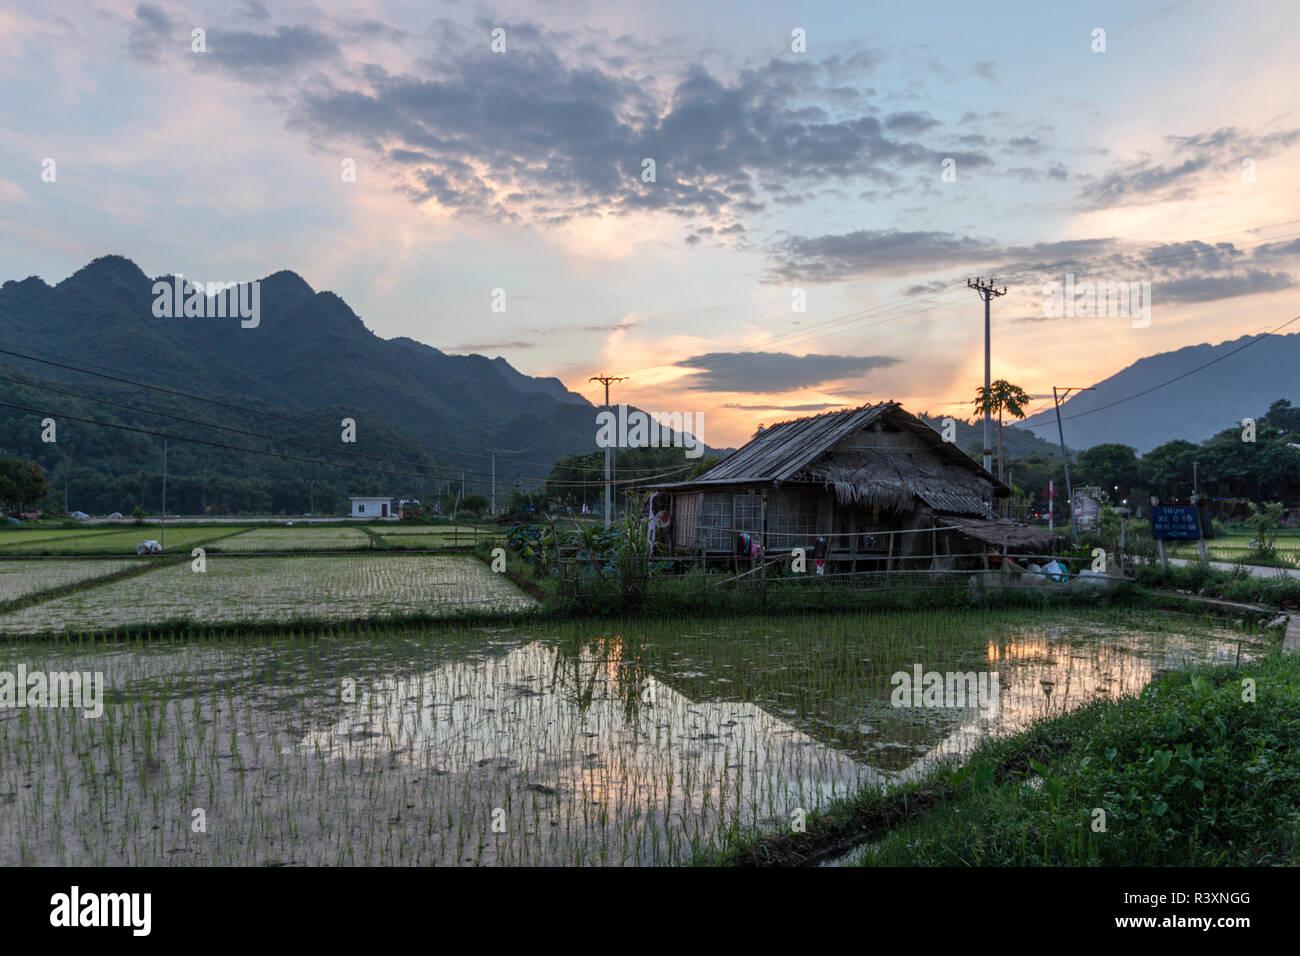 Mai Chau rice field, North Vietnam - Stock Image